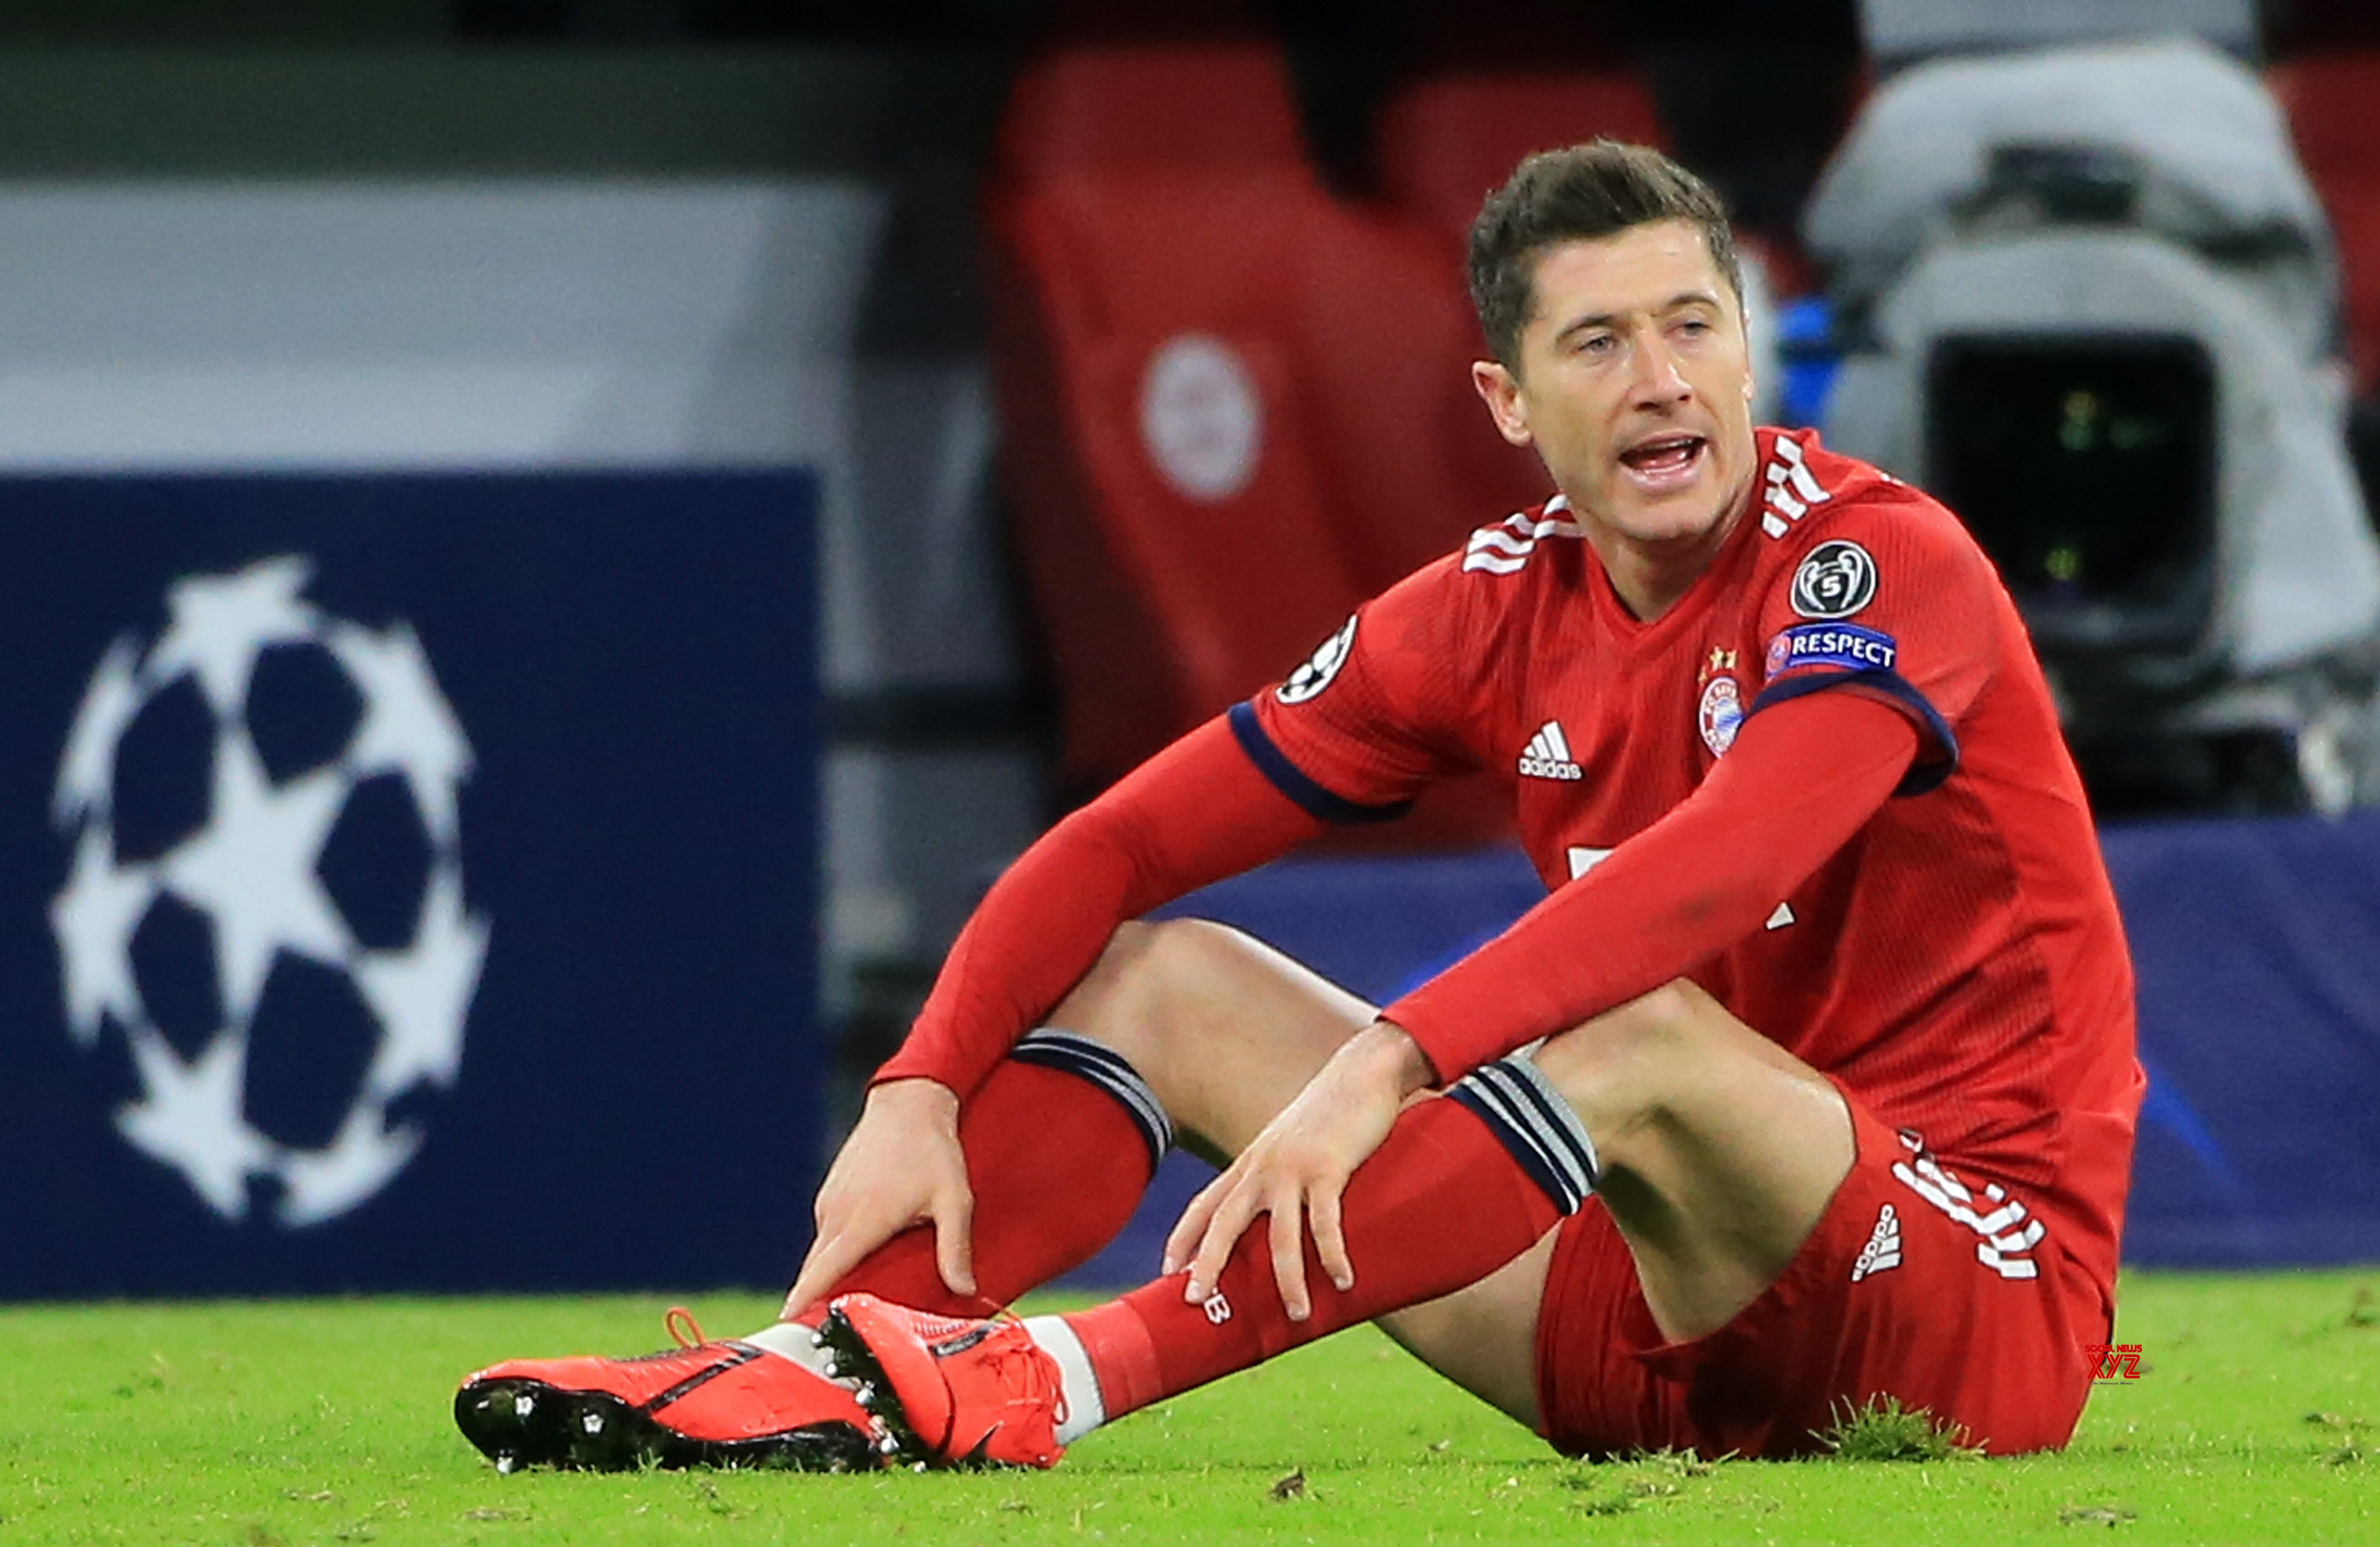 GERMANY - MUNICH - SOCCER - UEFA CHAMPIONS LEAGUE - 1/8 FINALS - BAYERN MUNICH VS LIVERPOO #Gallery